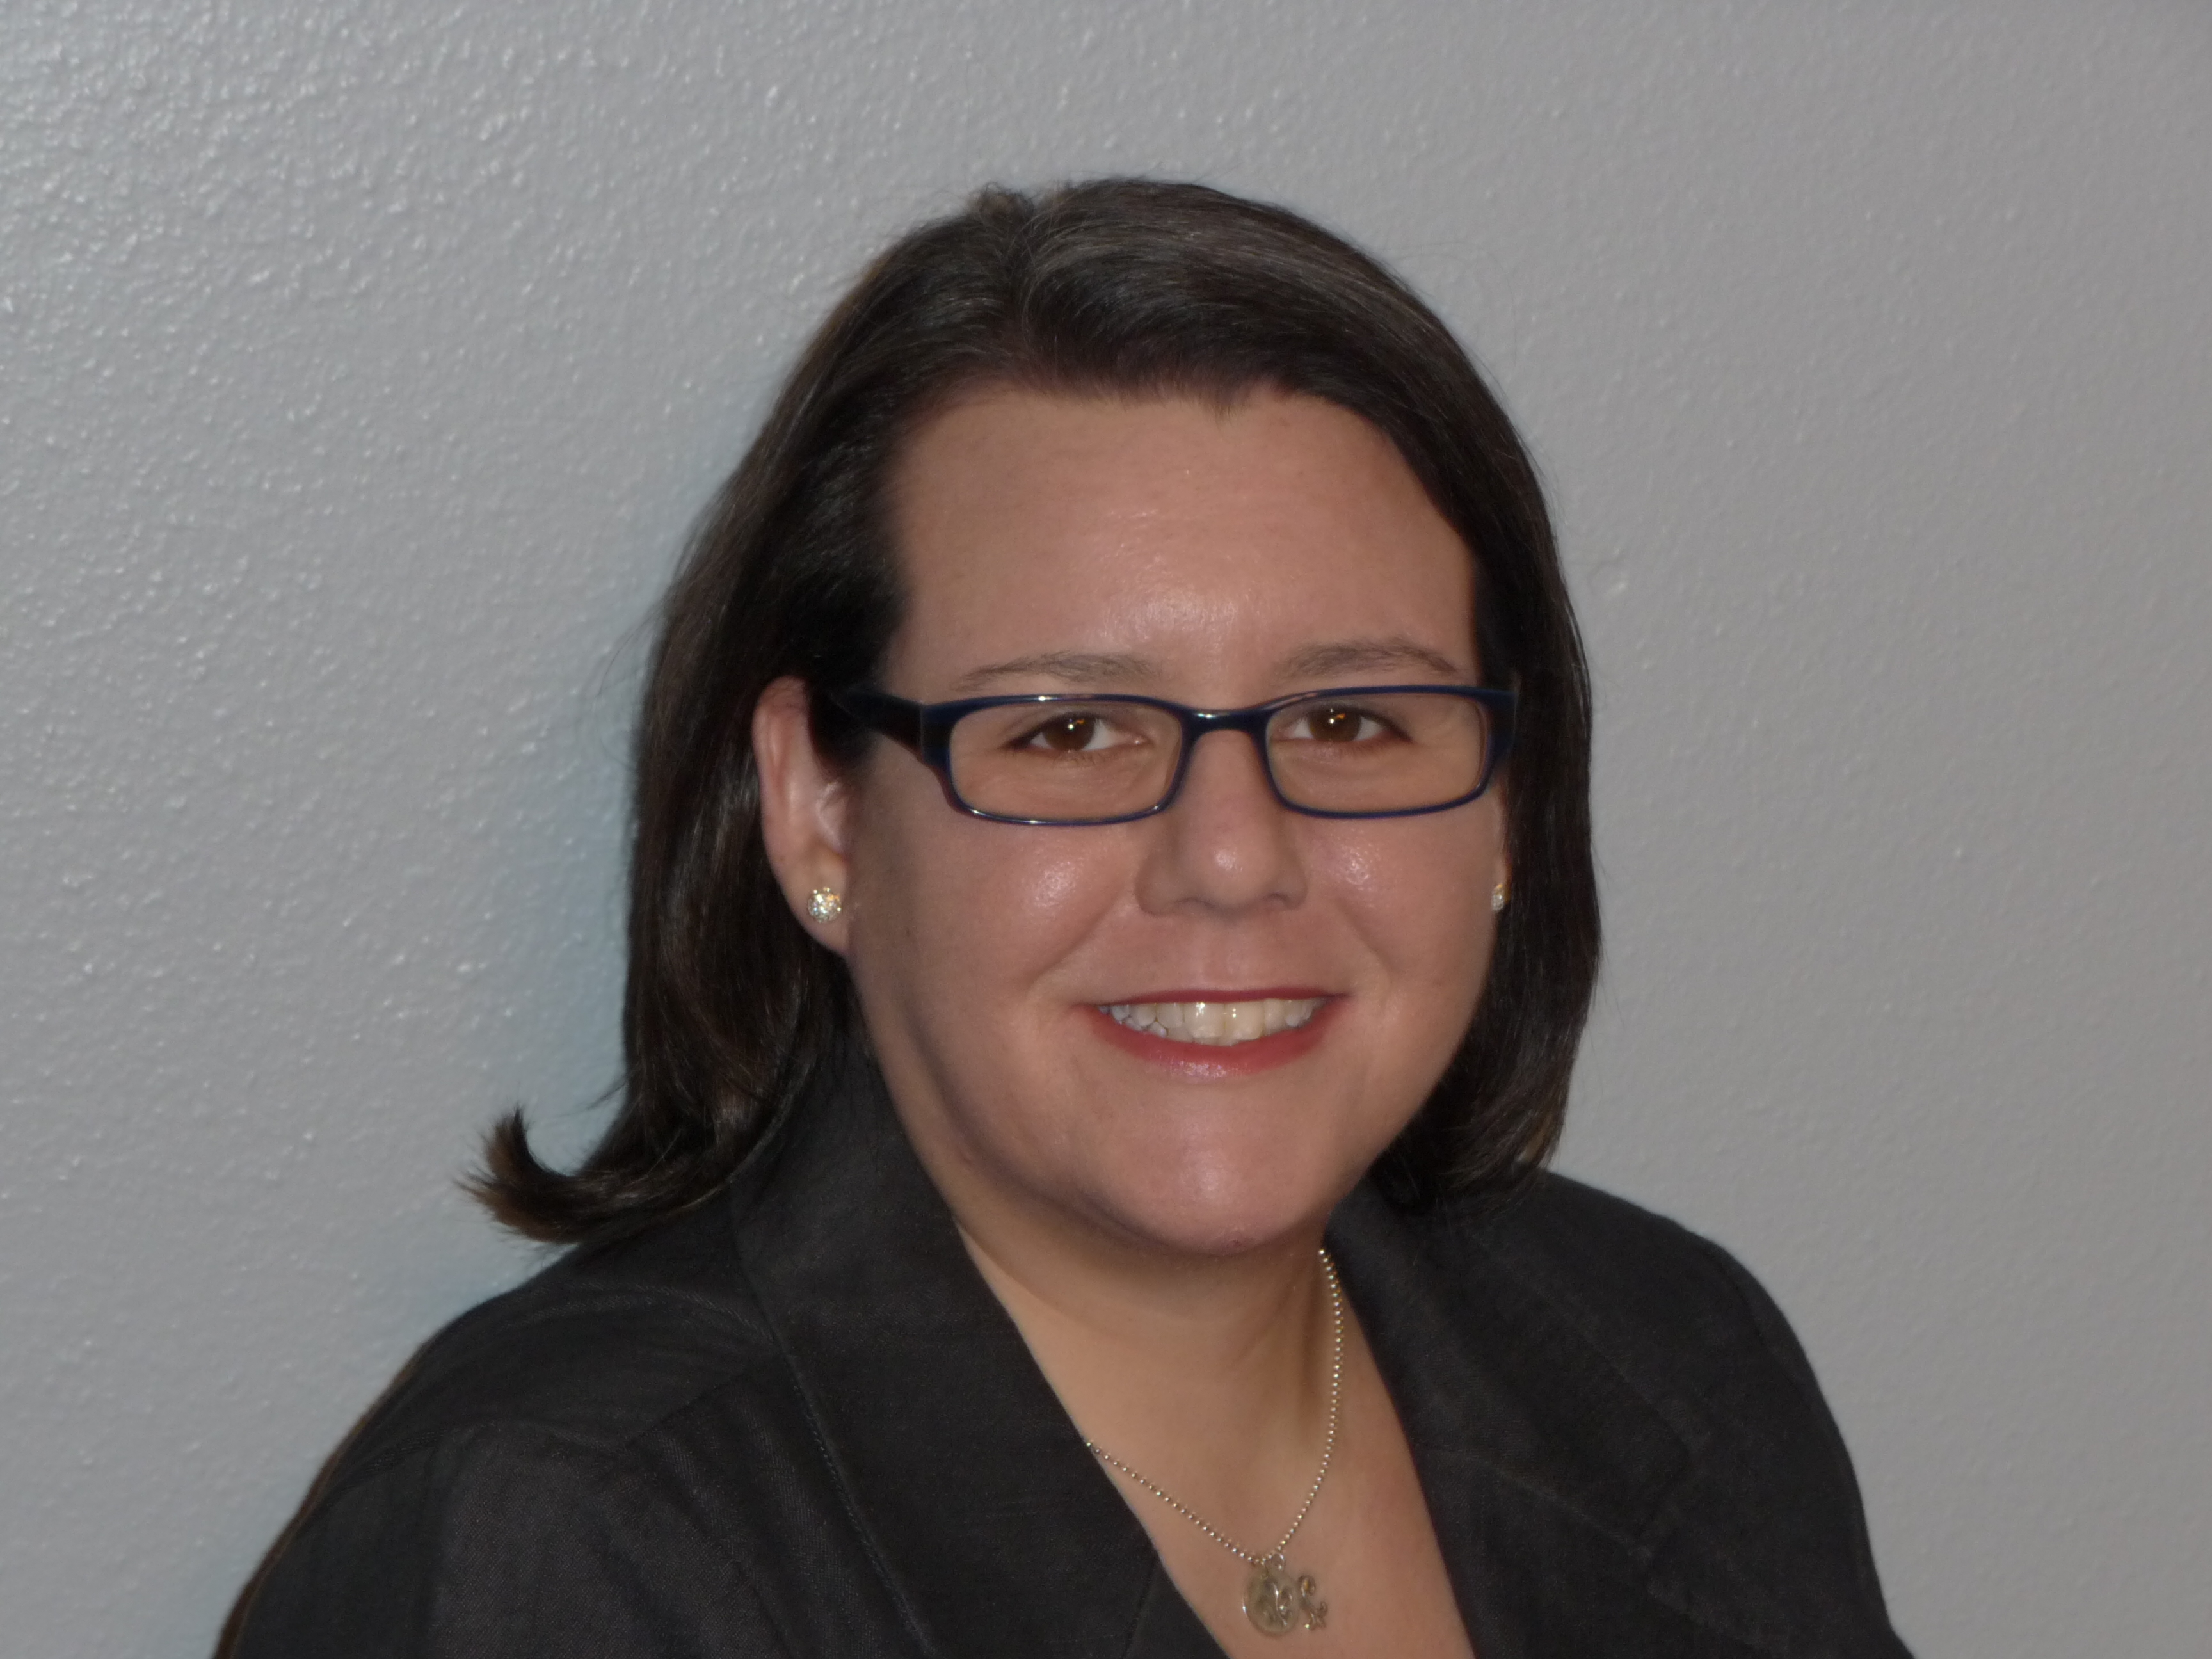 Picture of Antoinette Verdone